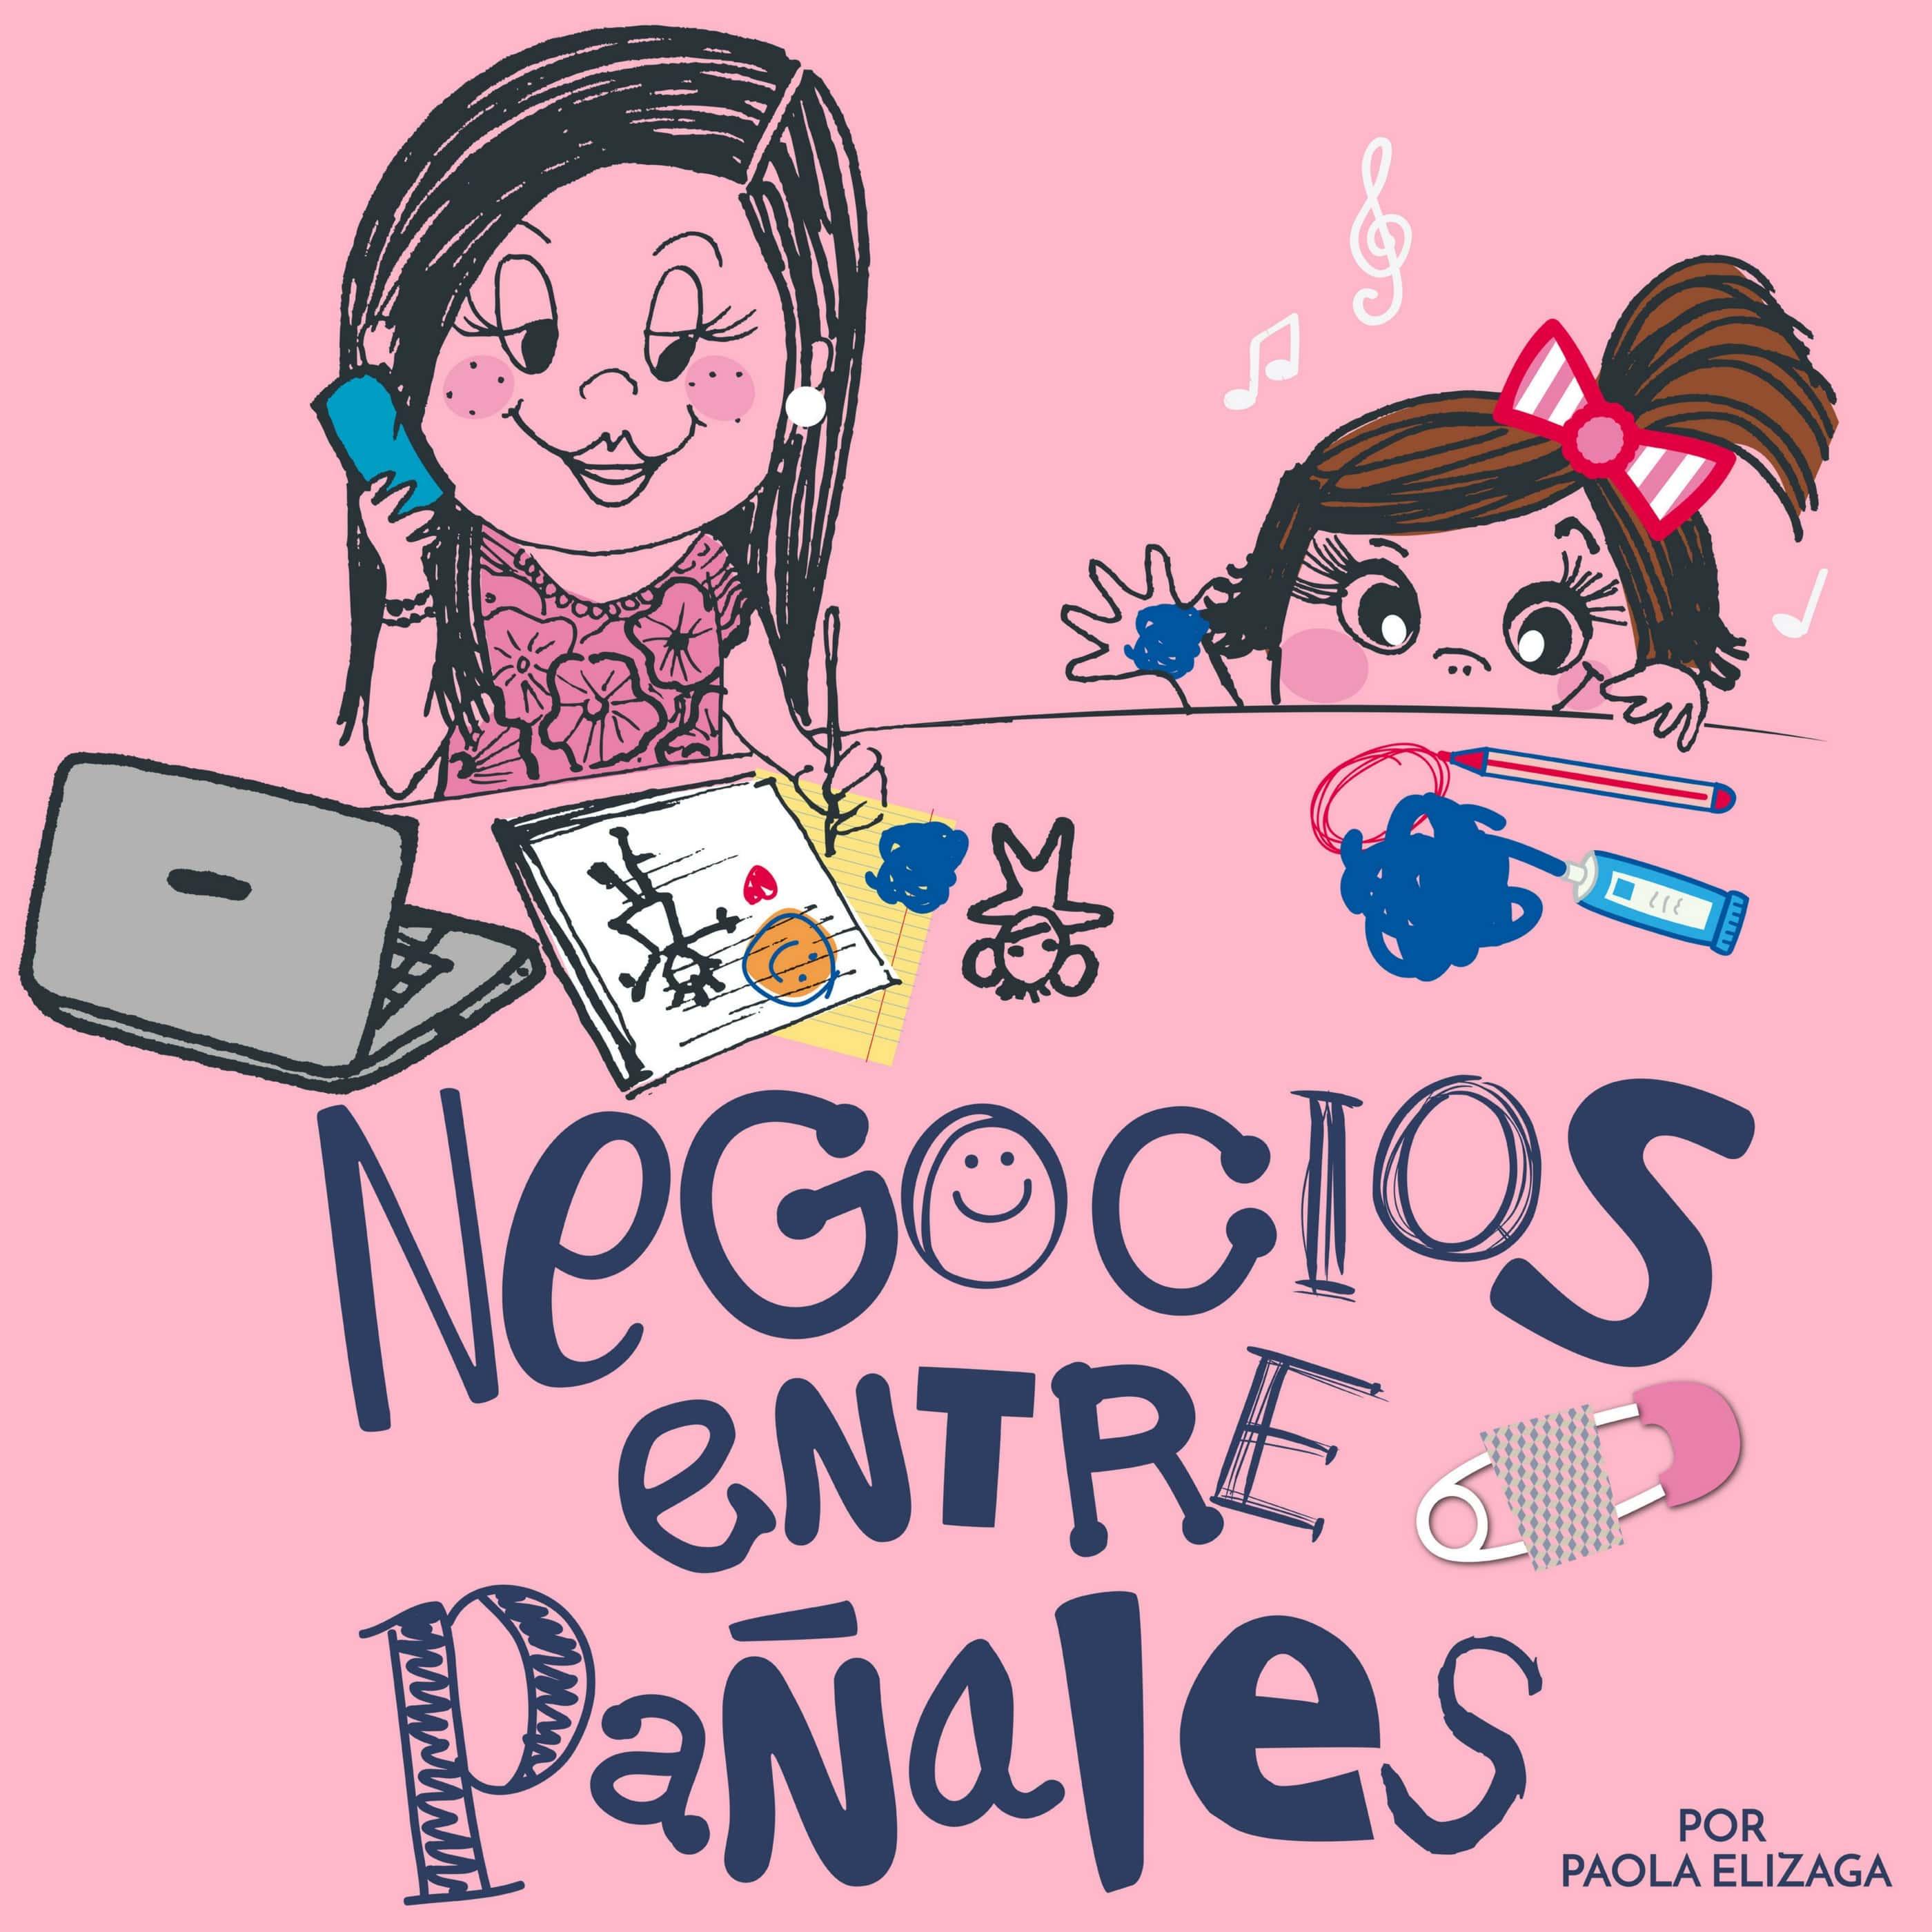 Negocios Entre Pañales con Paola Elízaga by Paola Elízaga on Apple Podcasts f133ca6aa75d